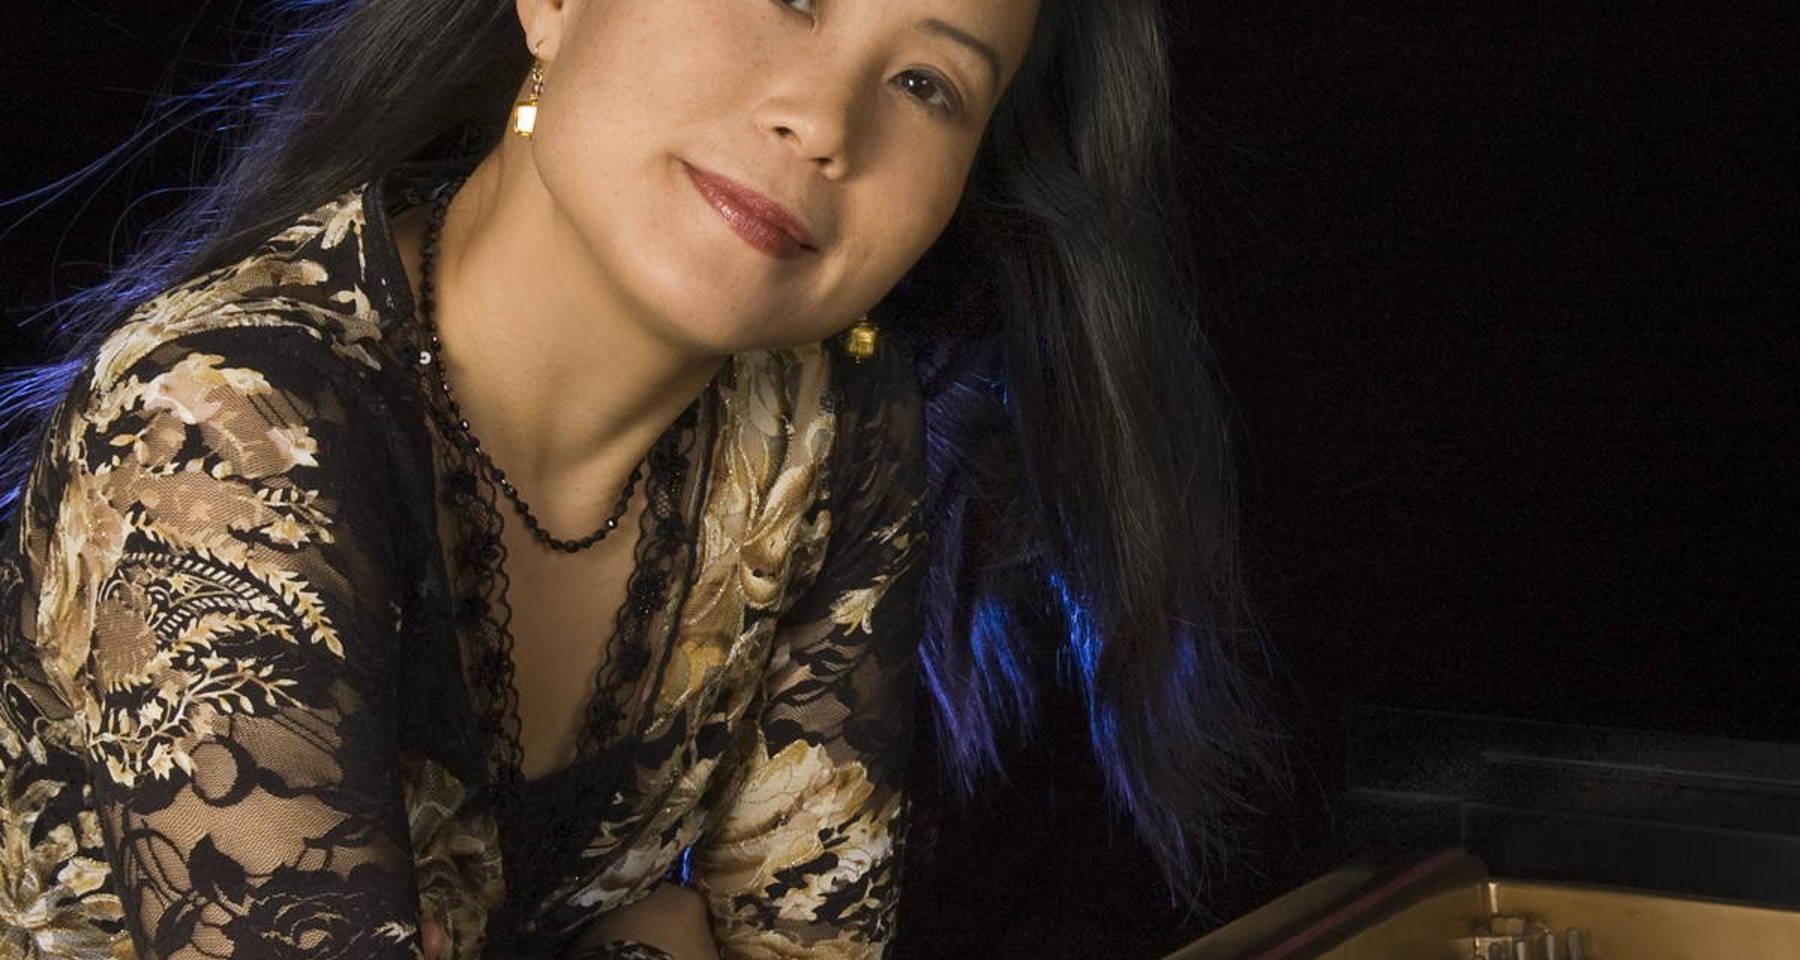 Music for Healing with Pianist Sarah Takagi